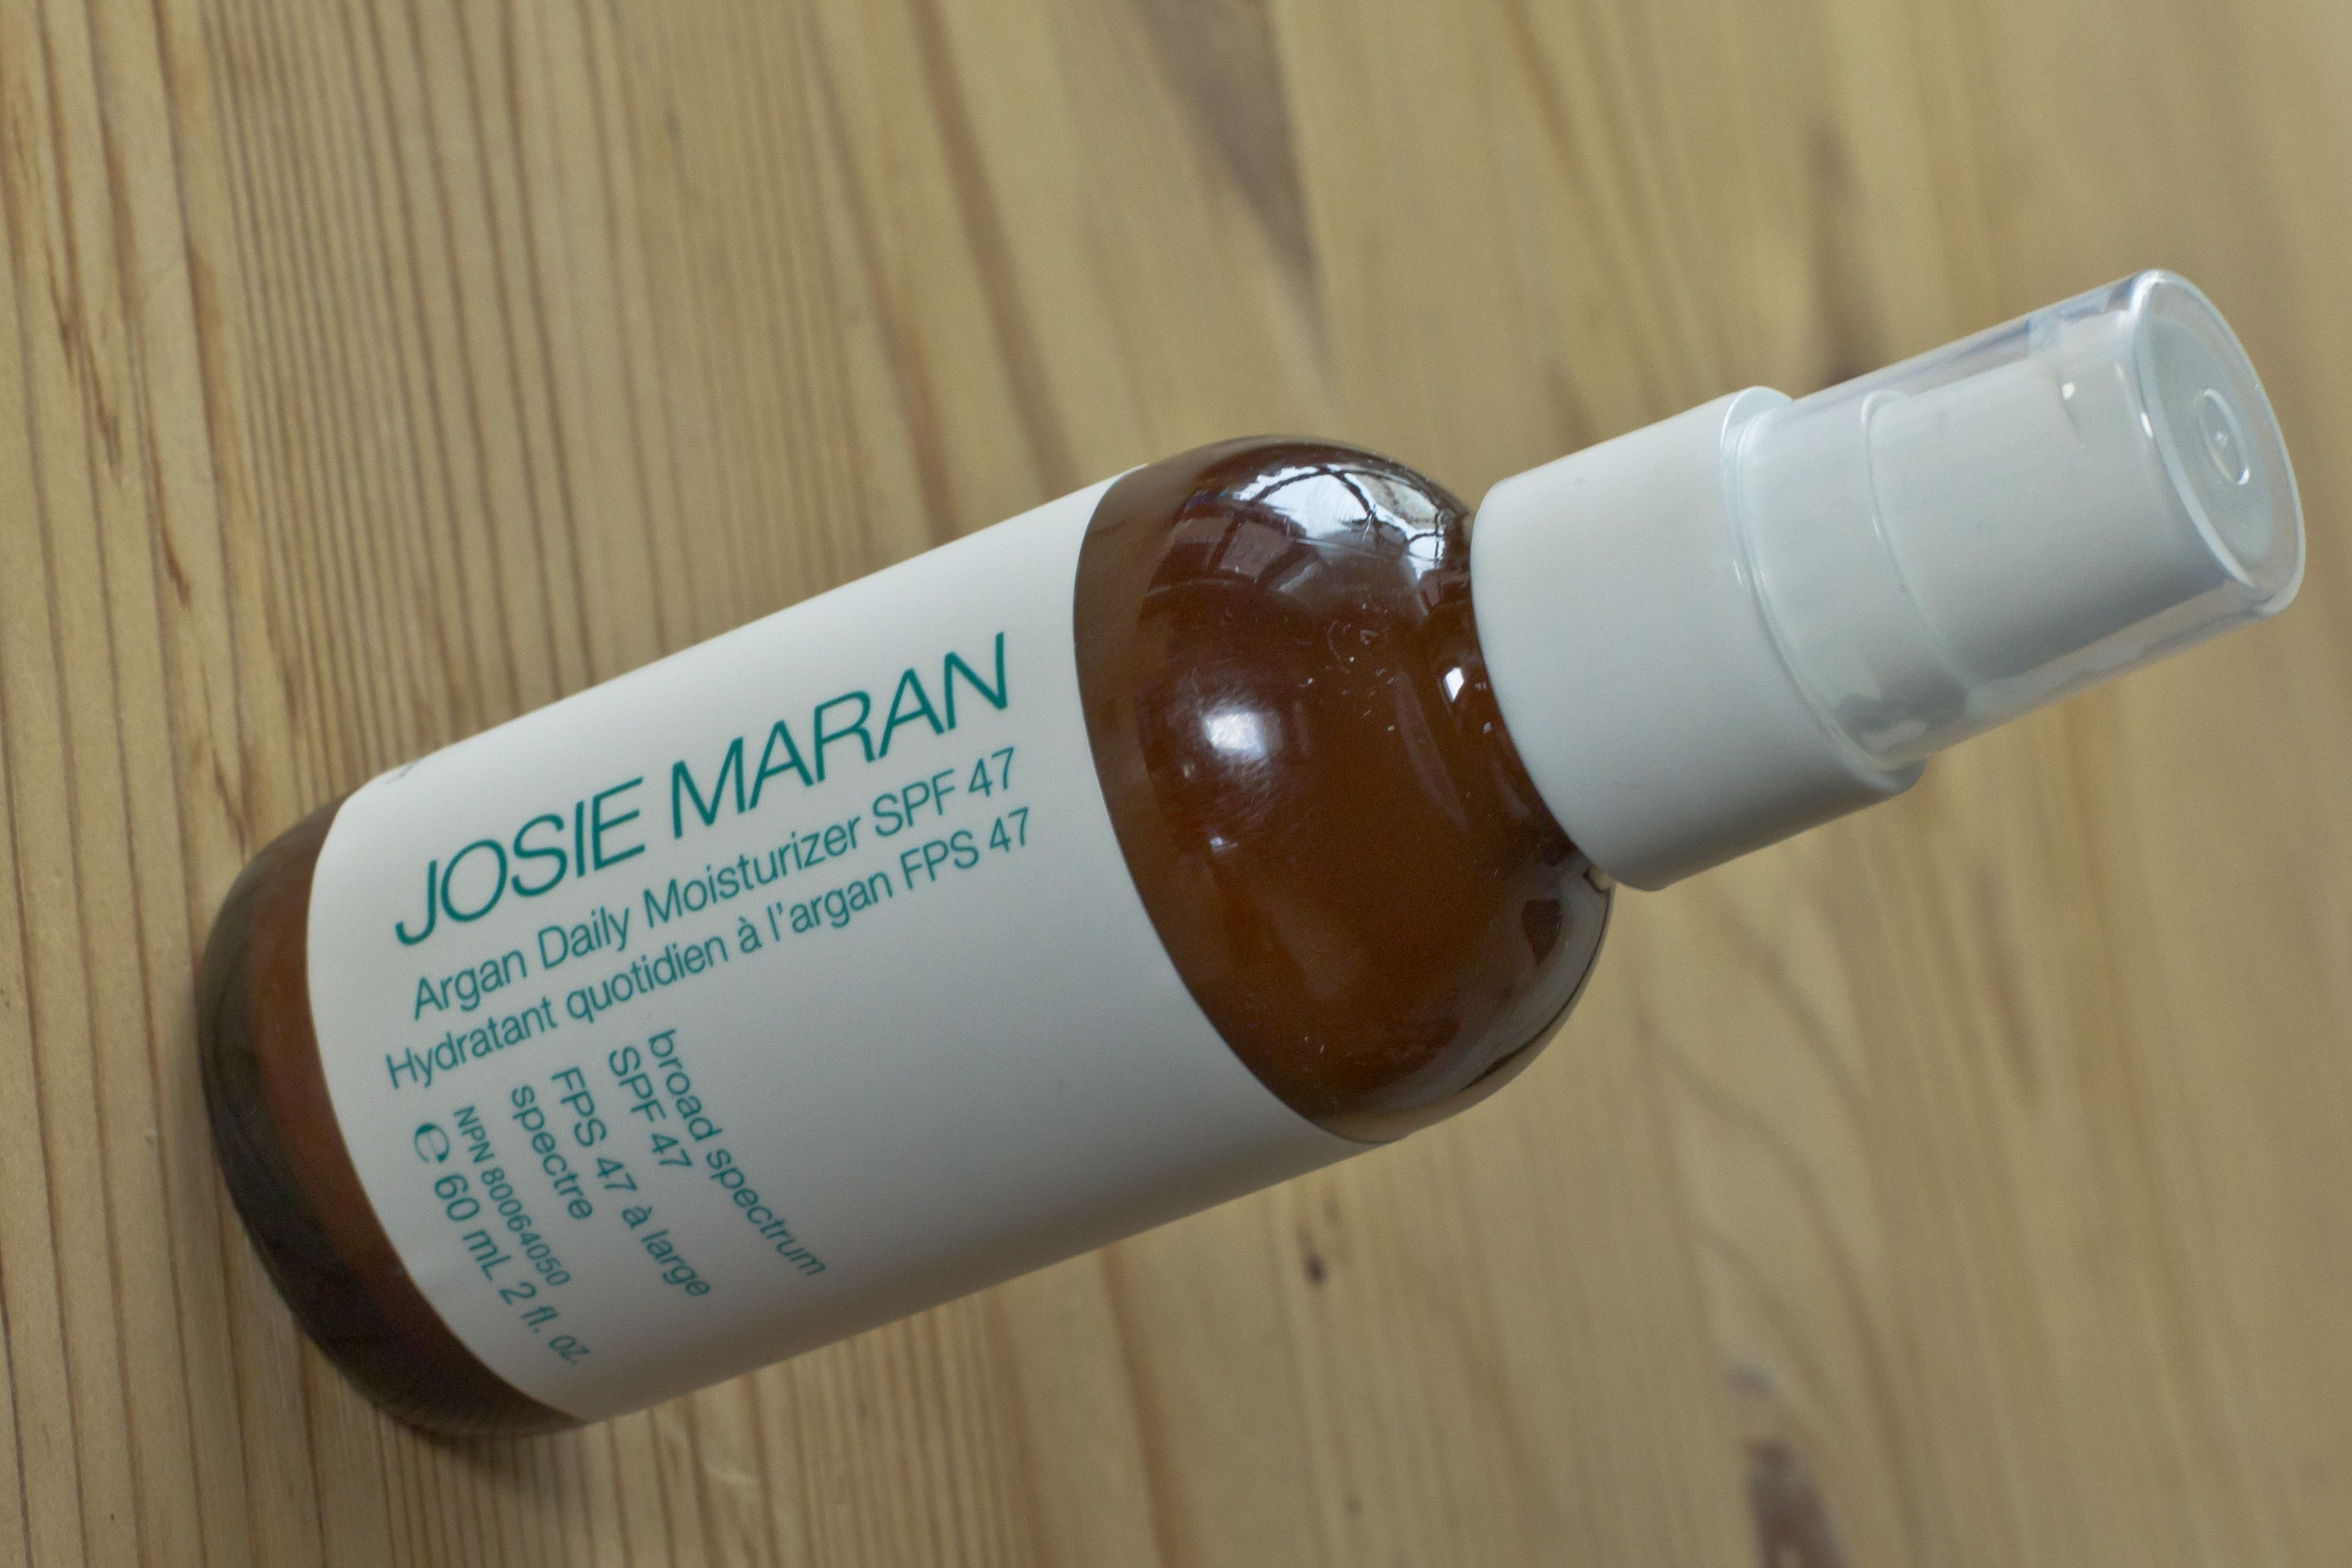 Review of Josie Maran Argan Daily Moisturizer SPF47 ...